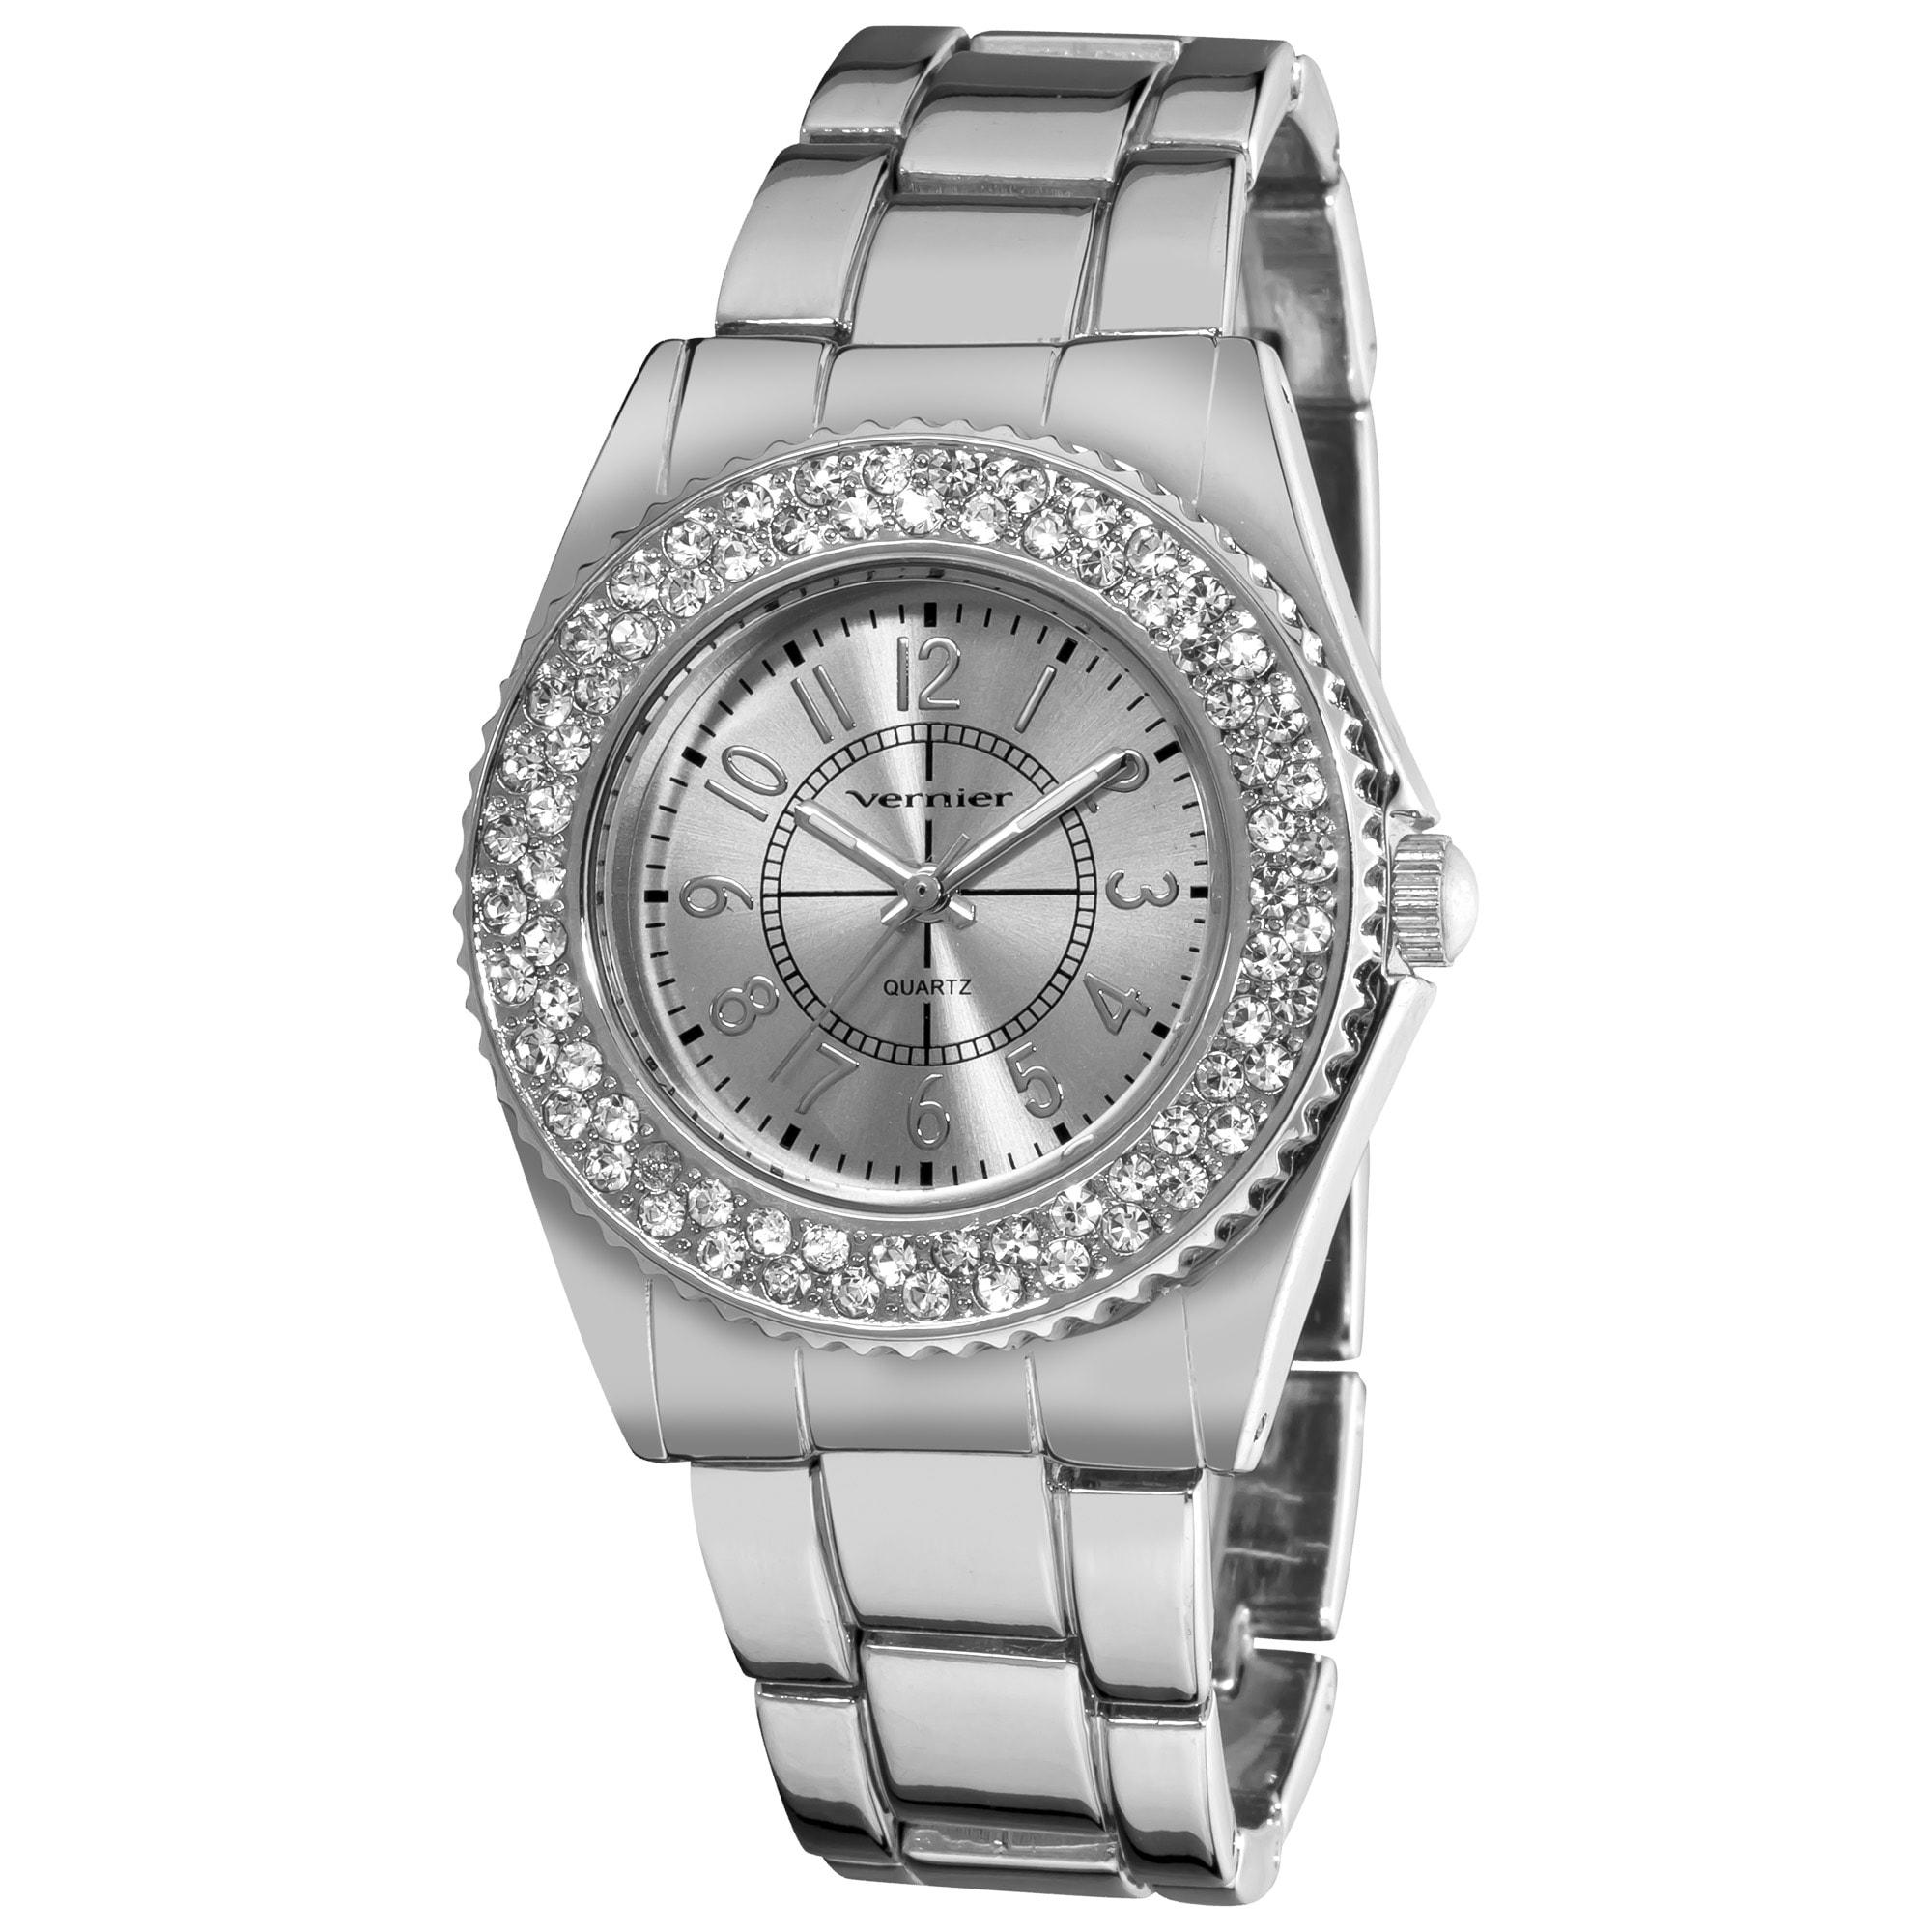 Vernier Women's Fashion Crystal Stone Bezel Bracelet Quartz Watch